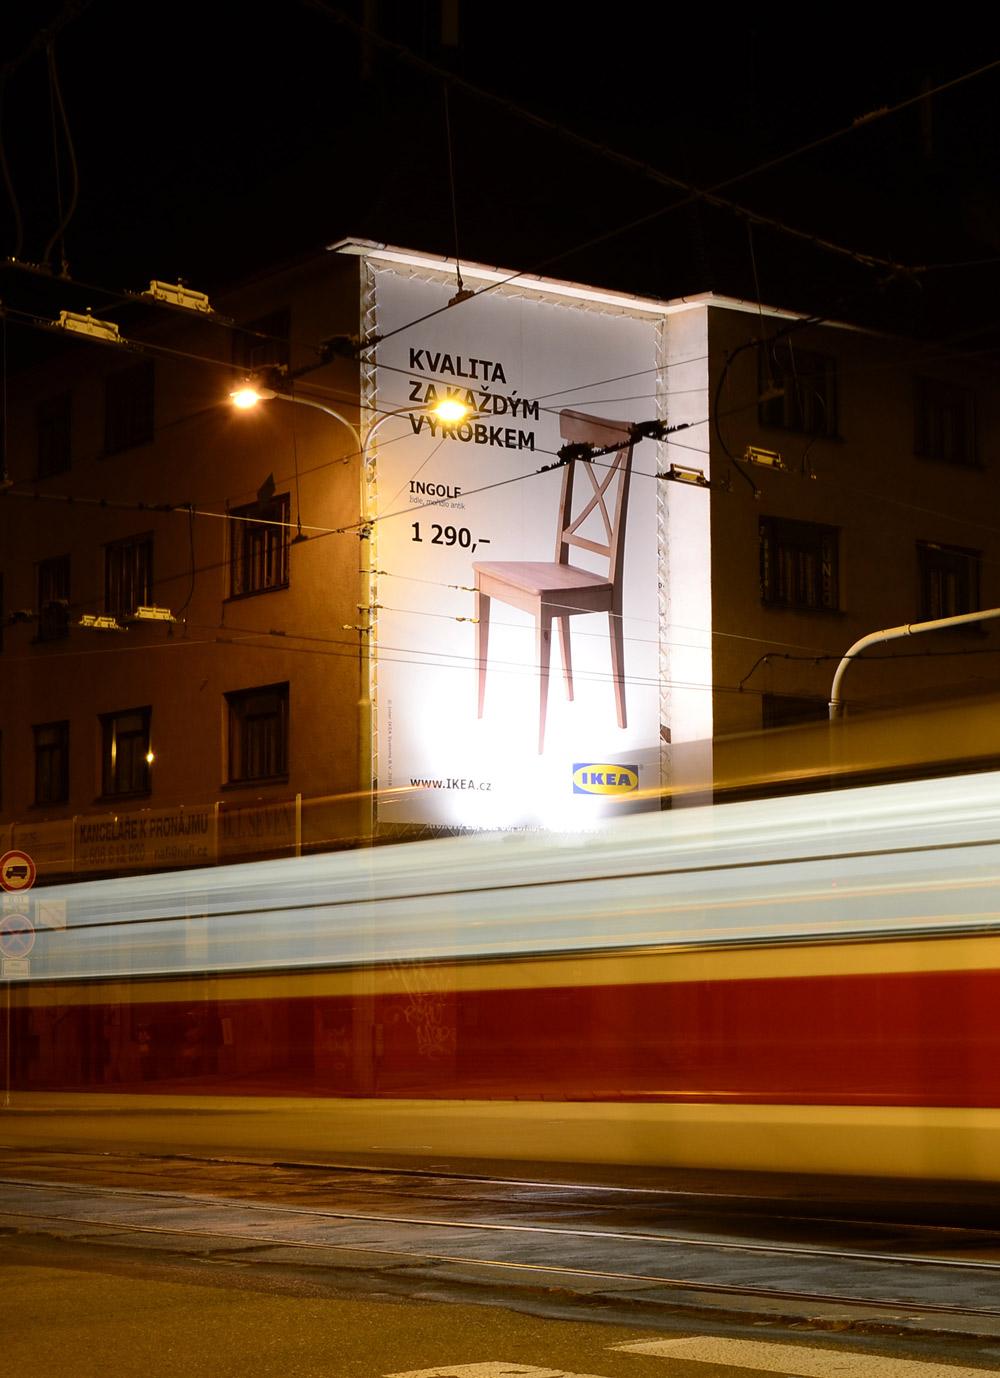 WEREK-MEDIA-Reklamni-plochy-Brno---023ZB-Provaznikova---klient-IKEA---OOH-kampan-10-2018-1000x1378